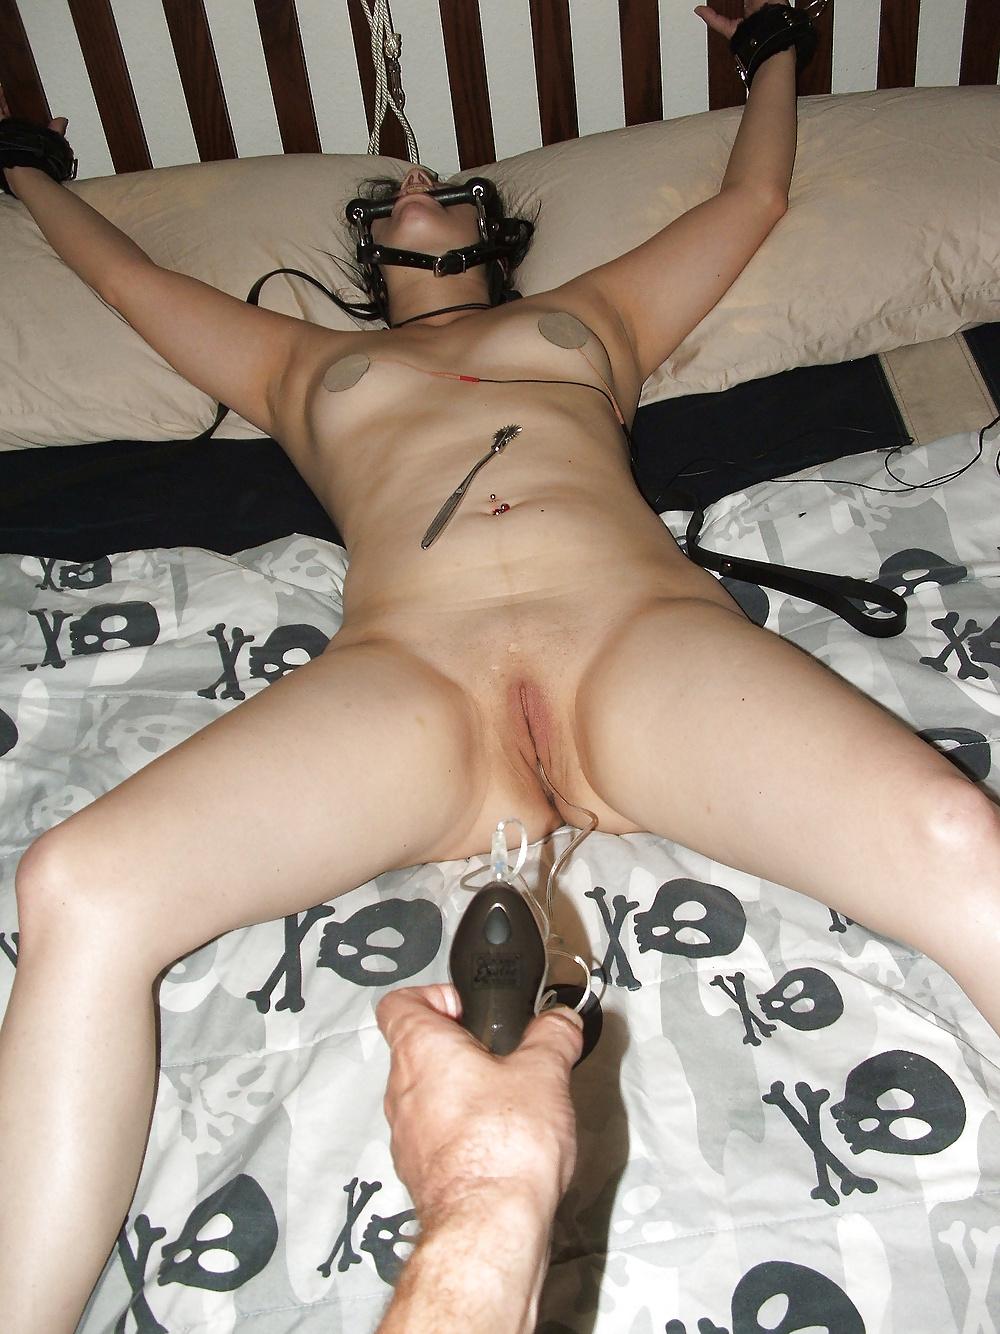 Amateur homemade bdsm porn